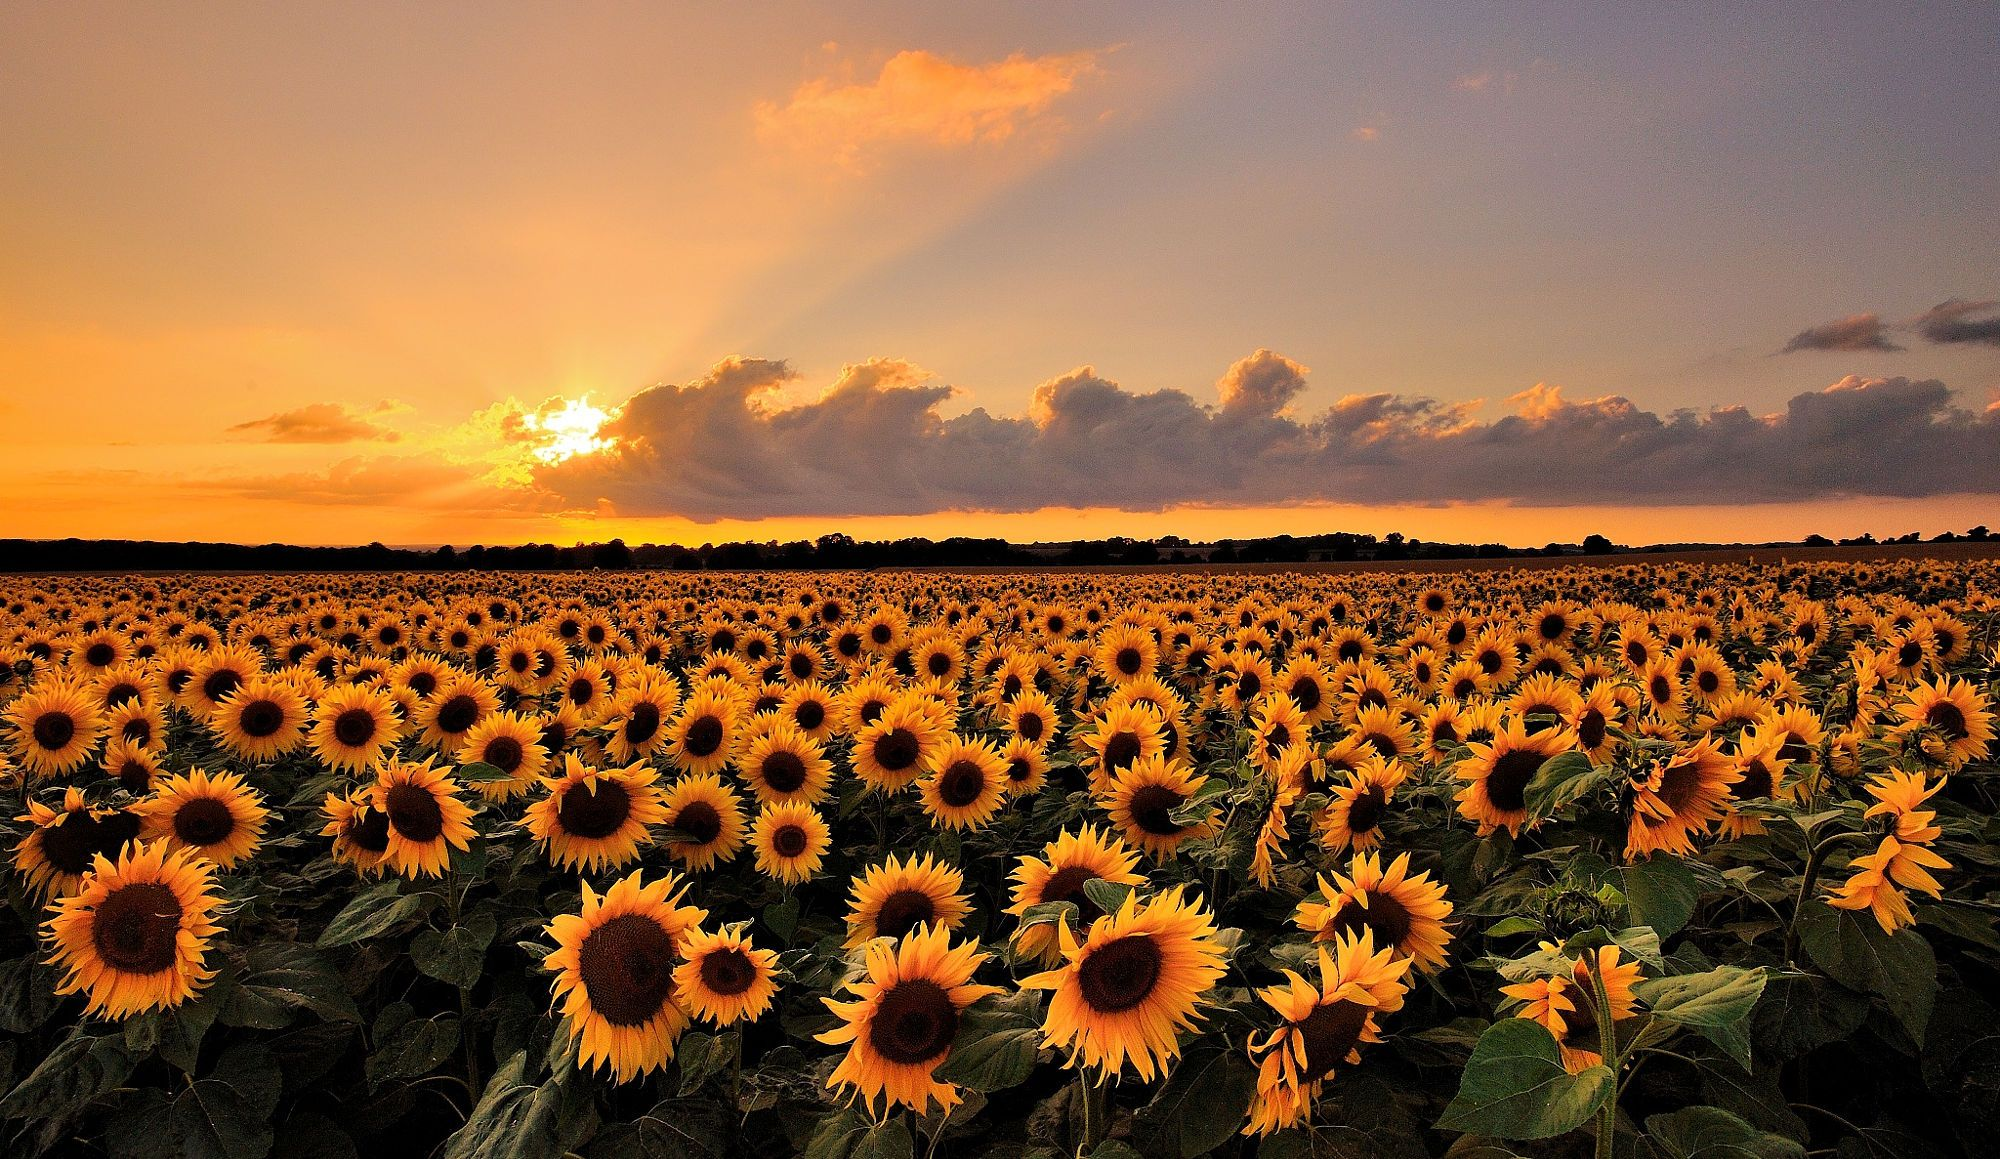 Sunflower Sunset Sunset Landscape Sunflower Sunset Nature Photography